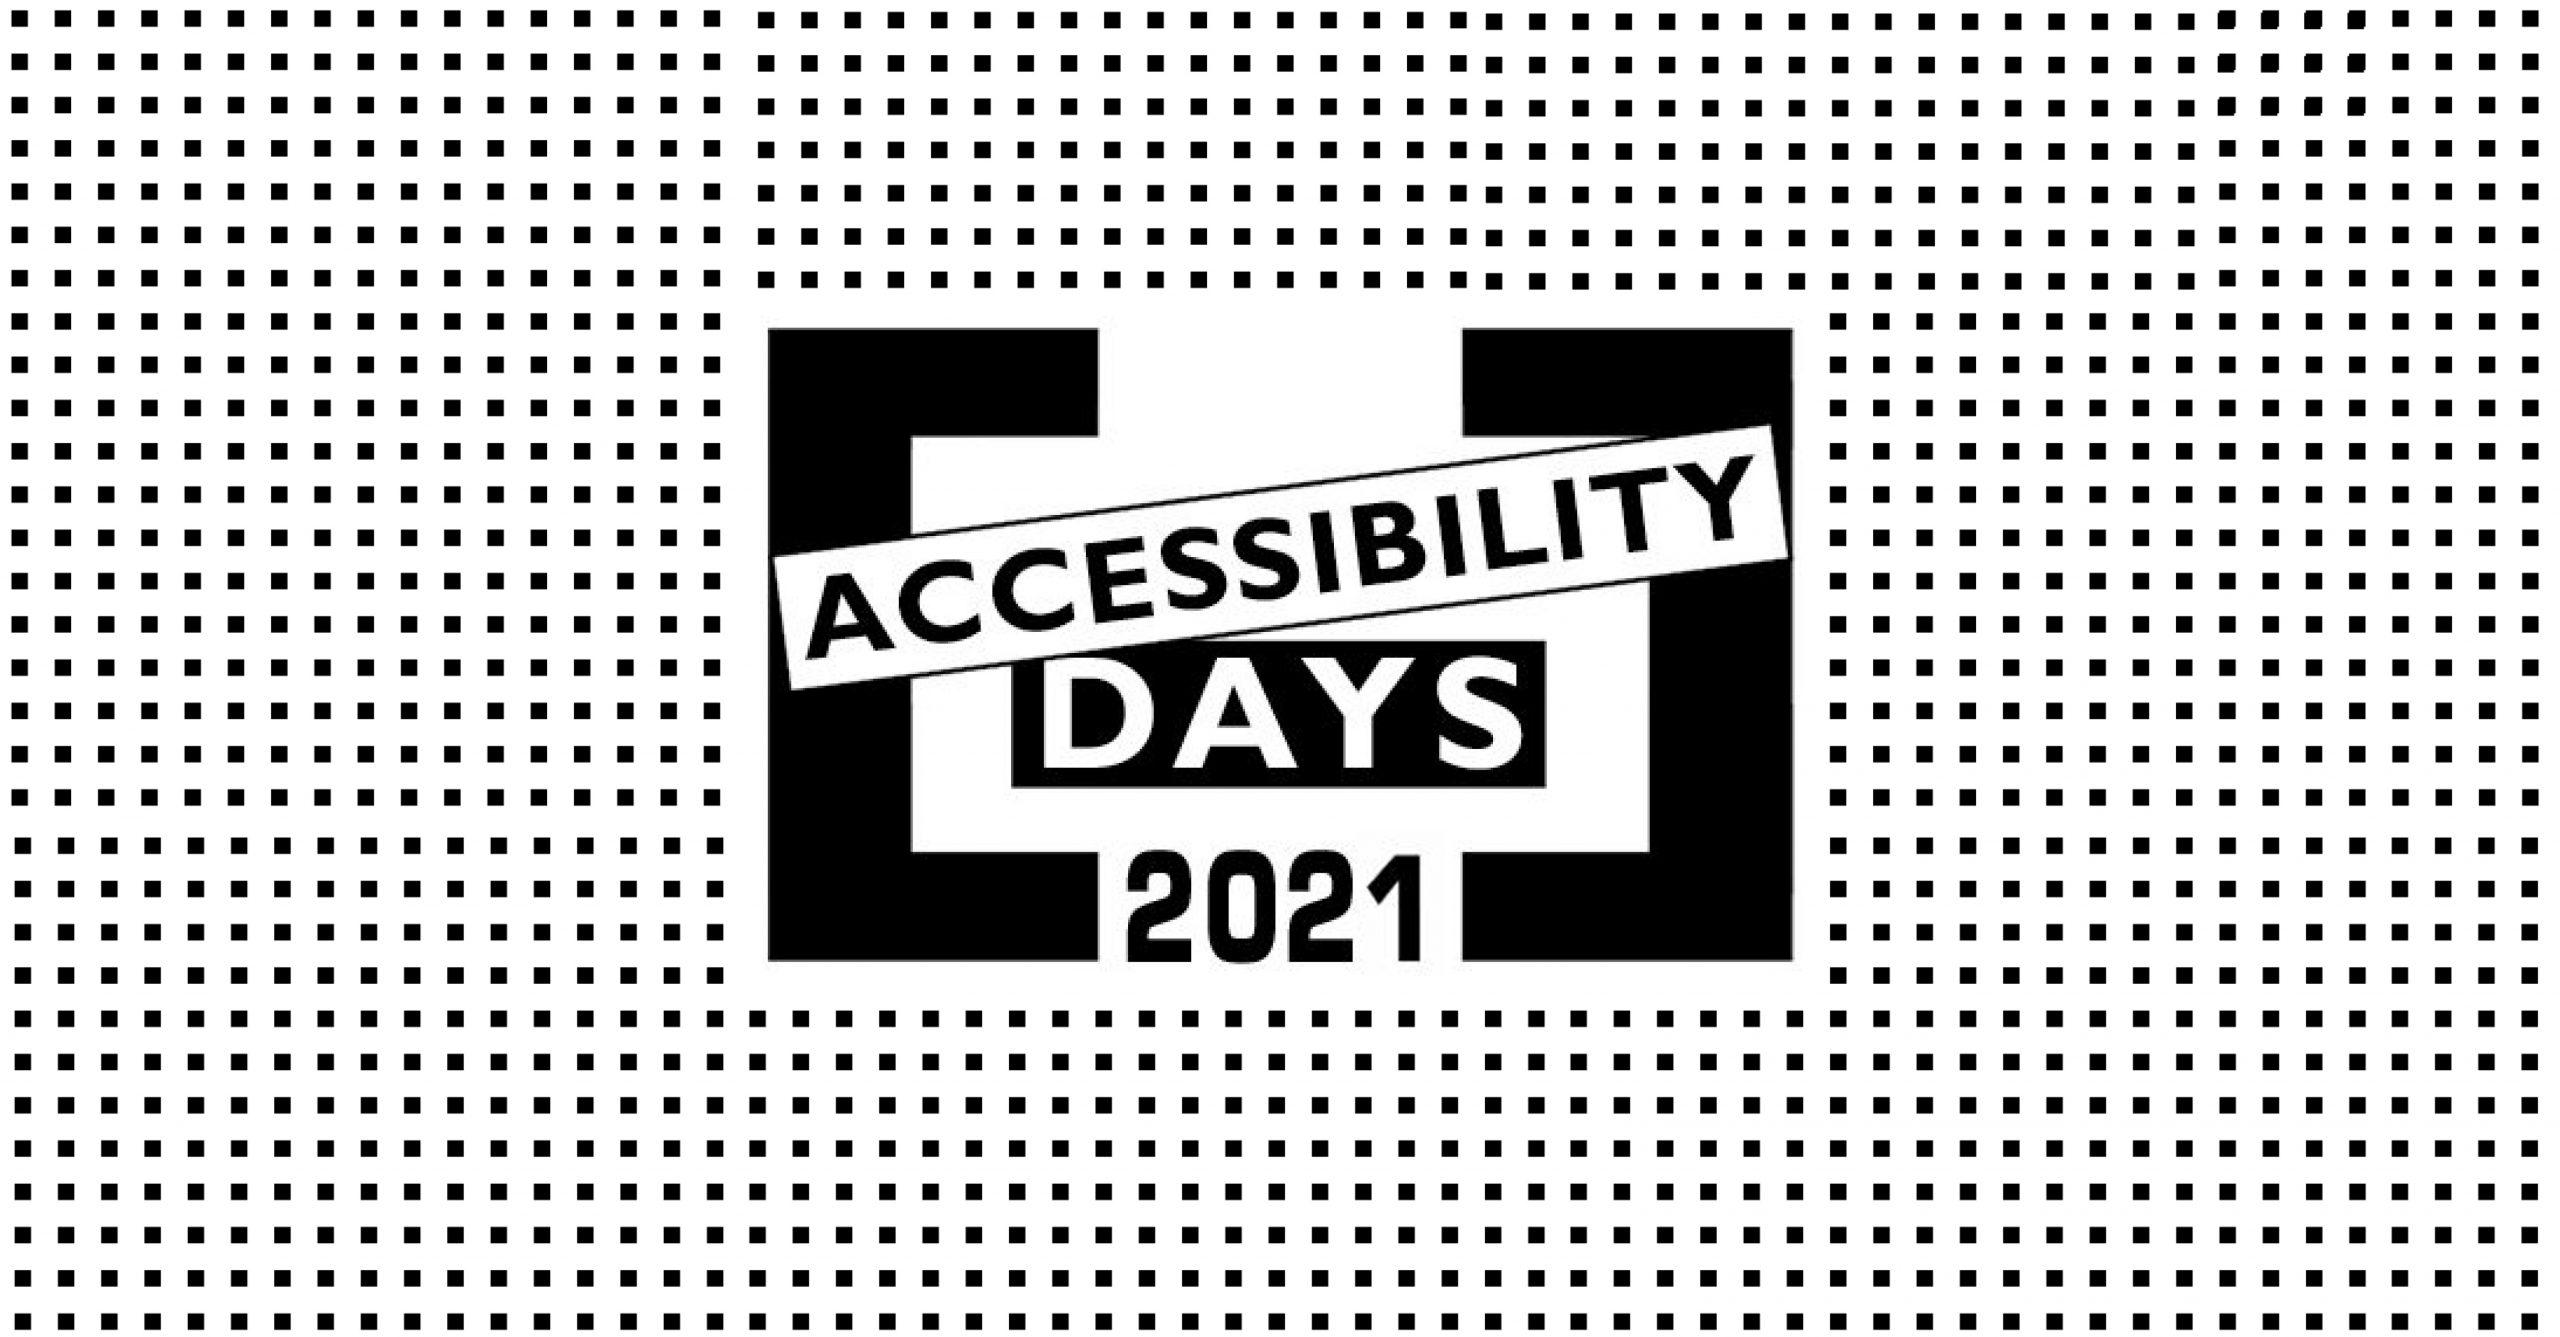 Logo degli Accessibility Days